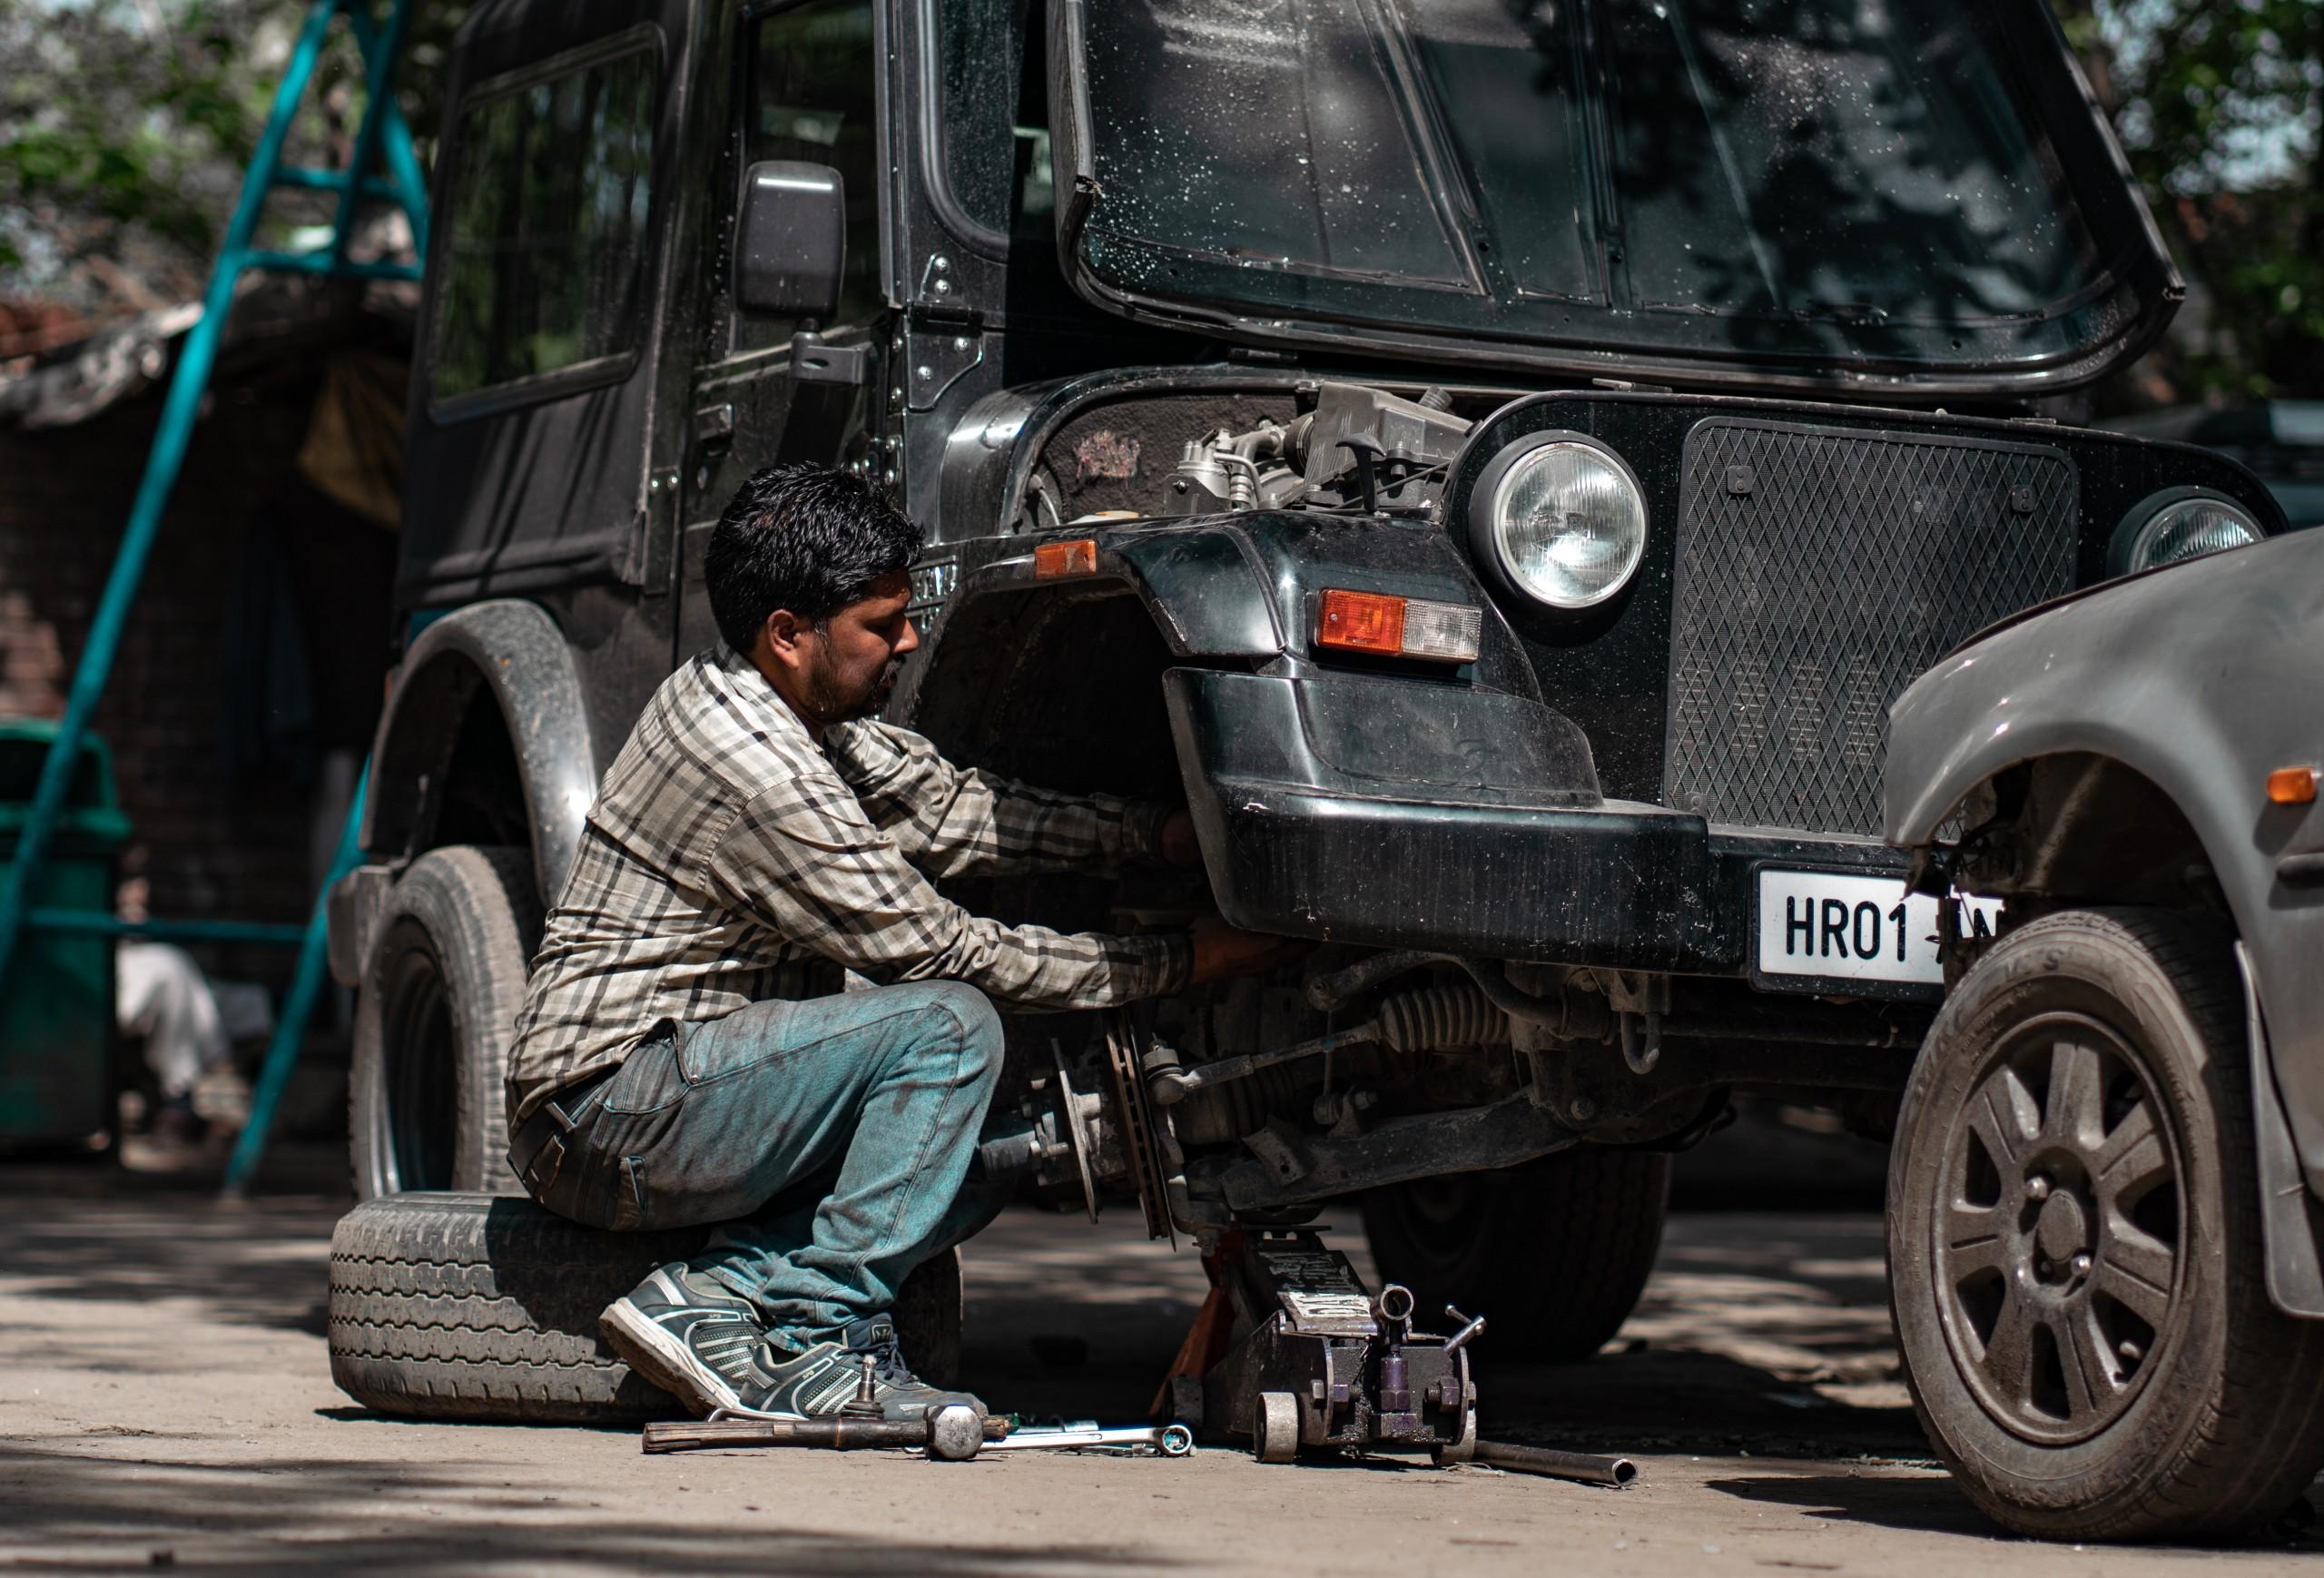 Automobile Mechanic fixing Tire